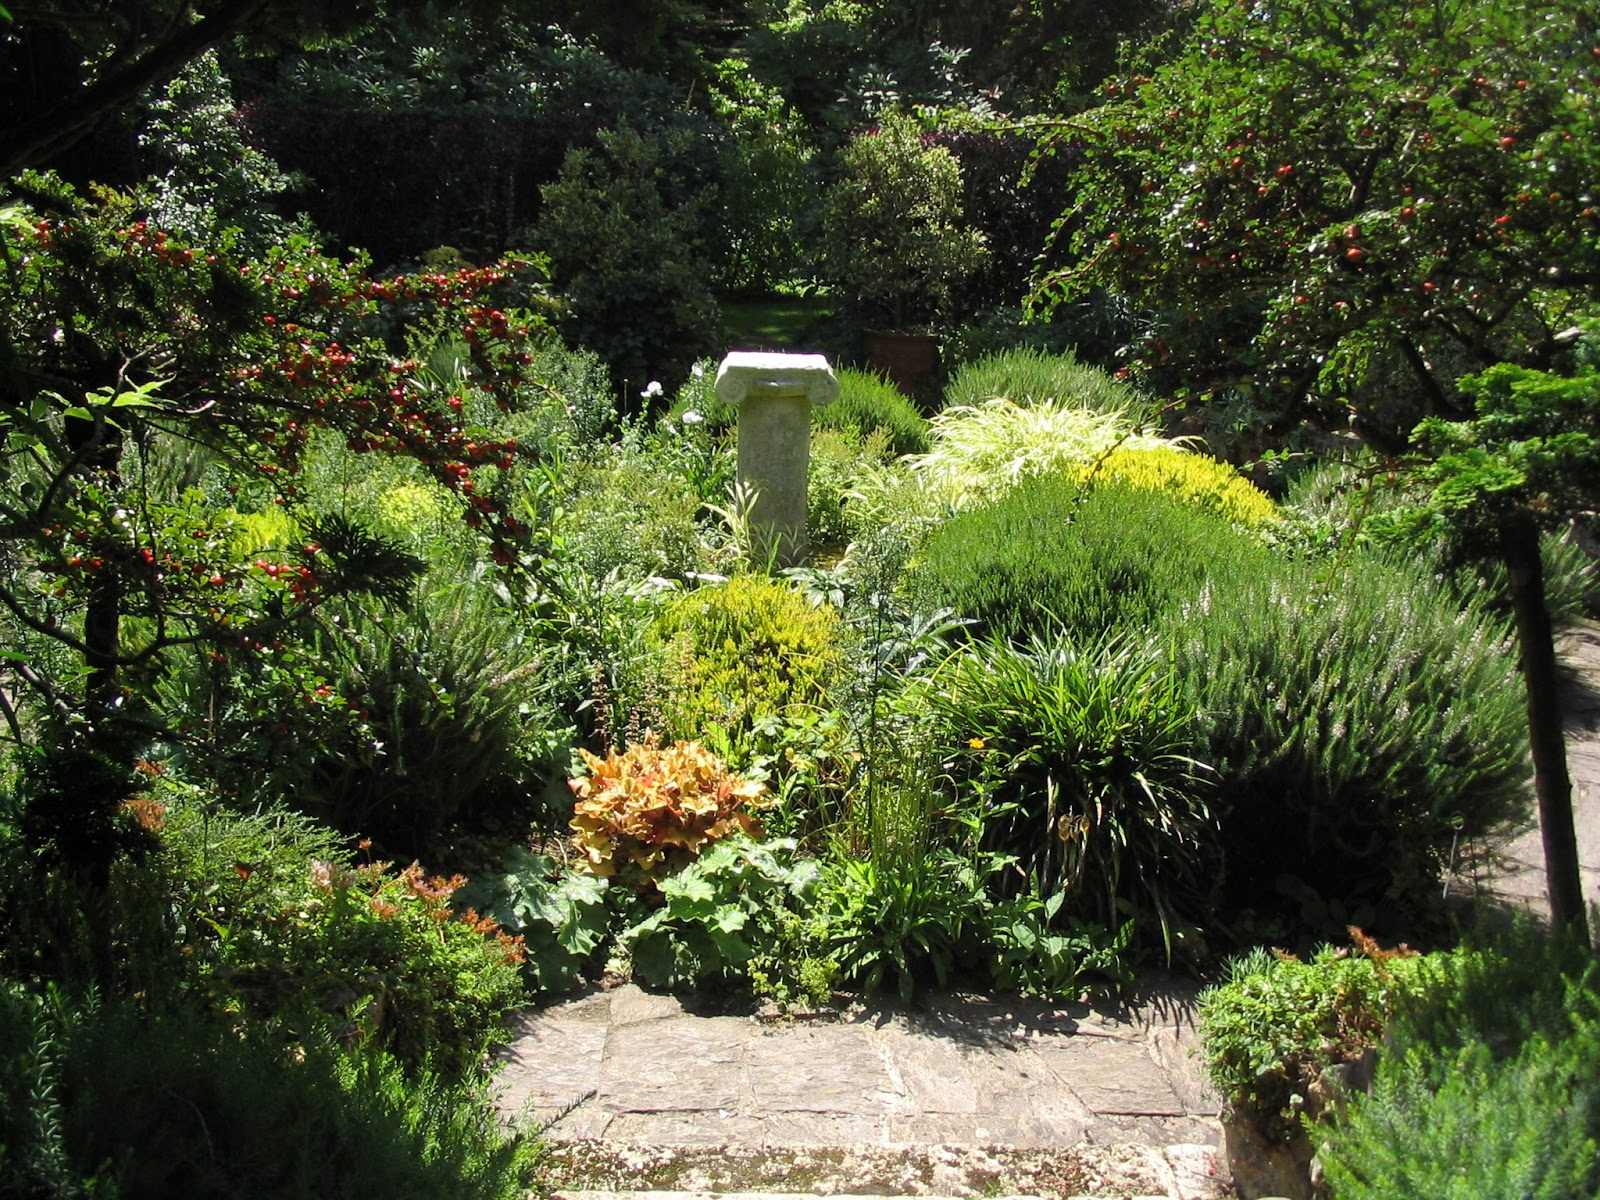 Le jardin de brigitte alsace jardin de la petite rochelle - Les jardins d alsace ...